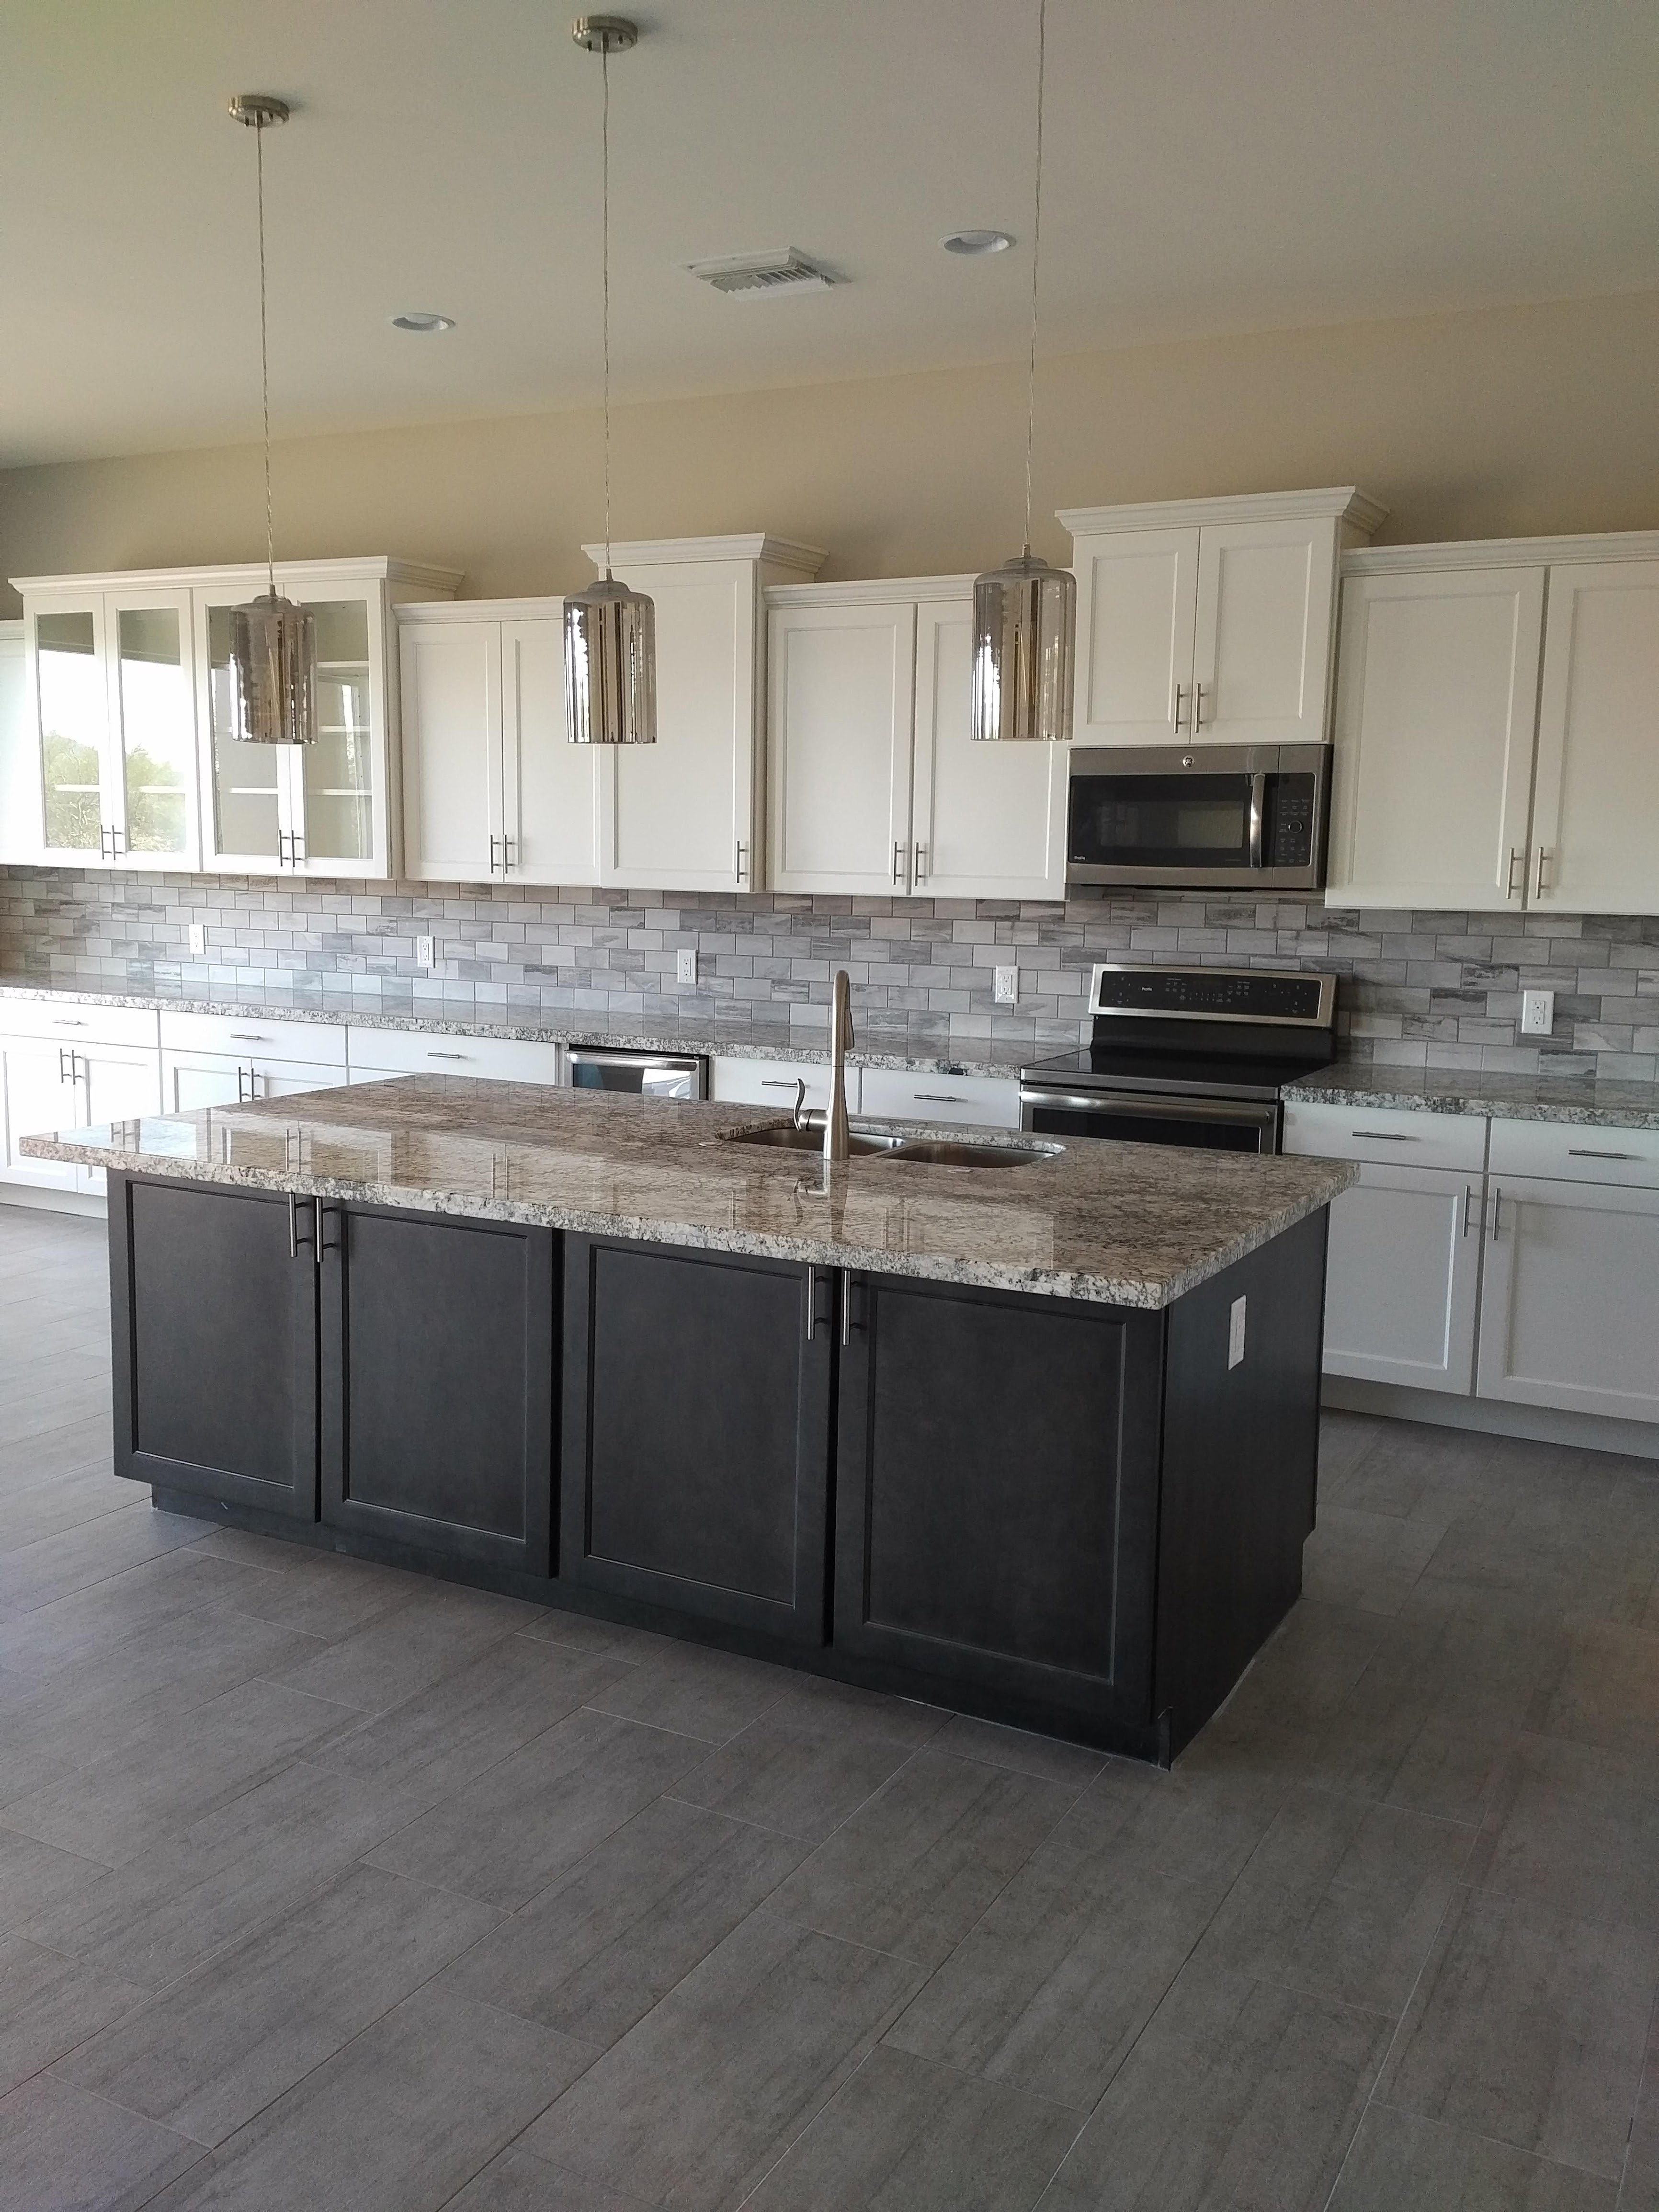 Carpet Tiles For Kitchen Kitchen Cabinets Flooring Countertops Carpet Tile Granite